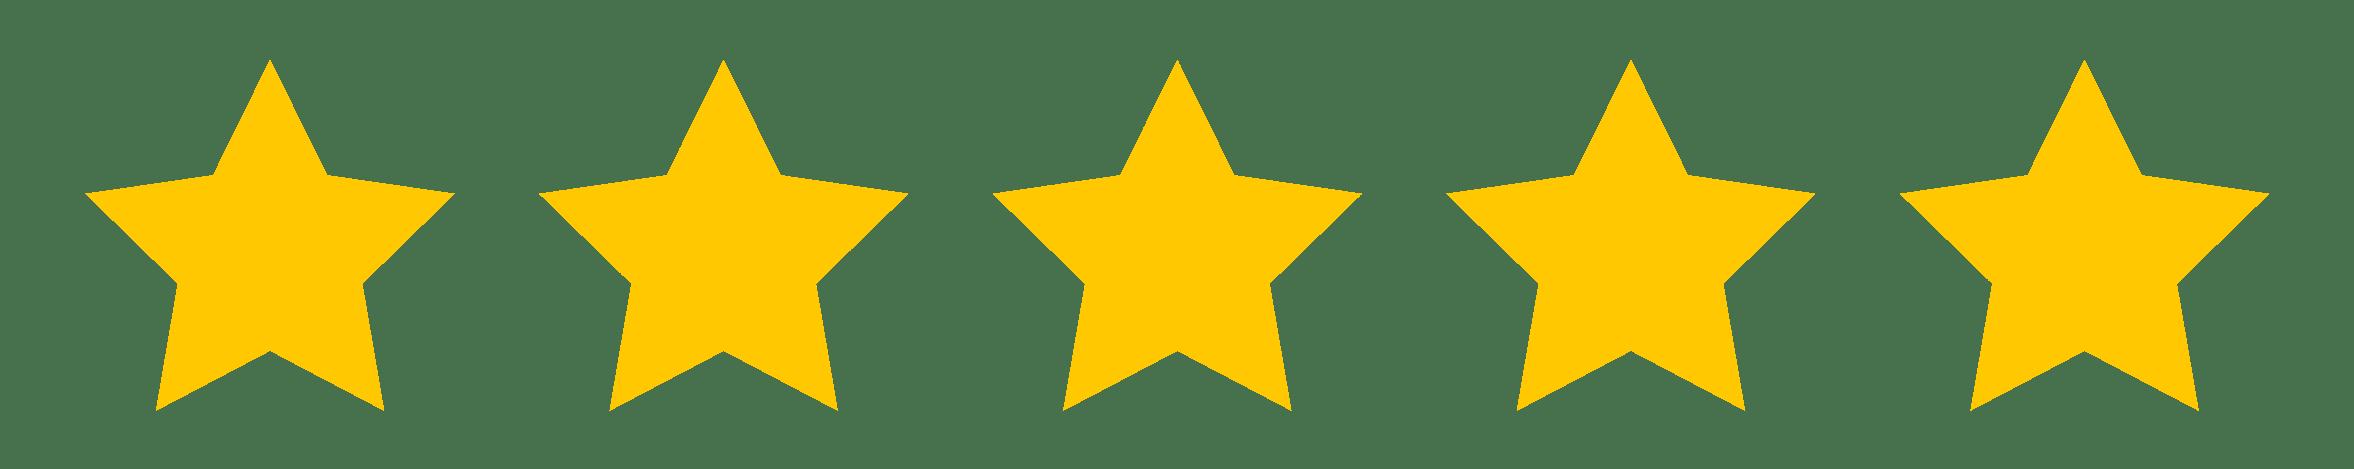 Five star graphic